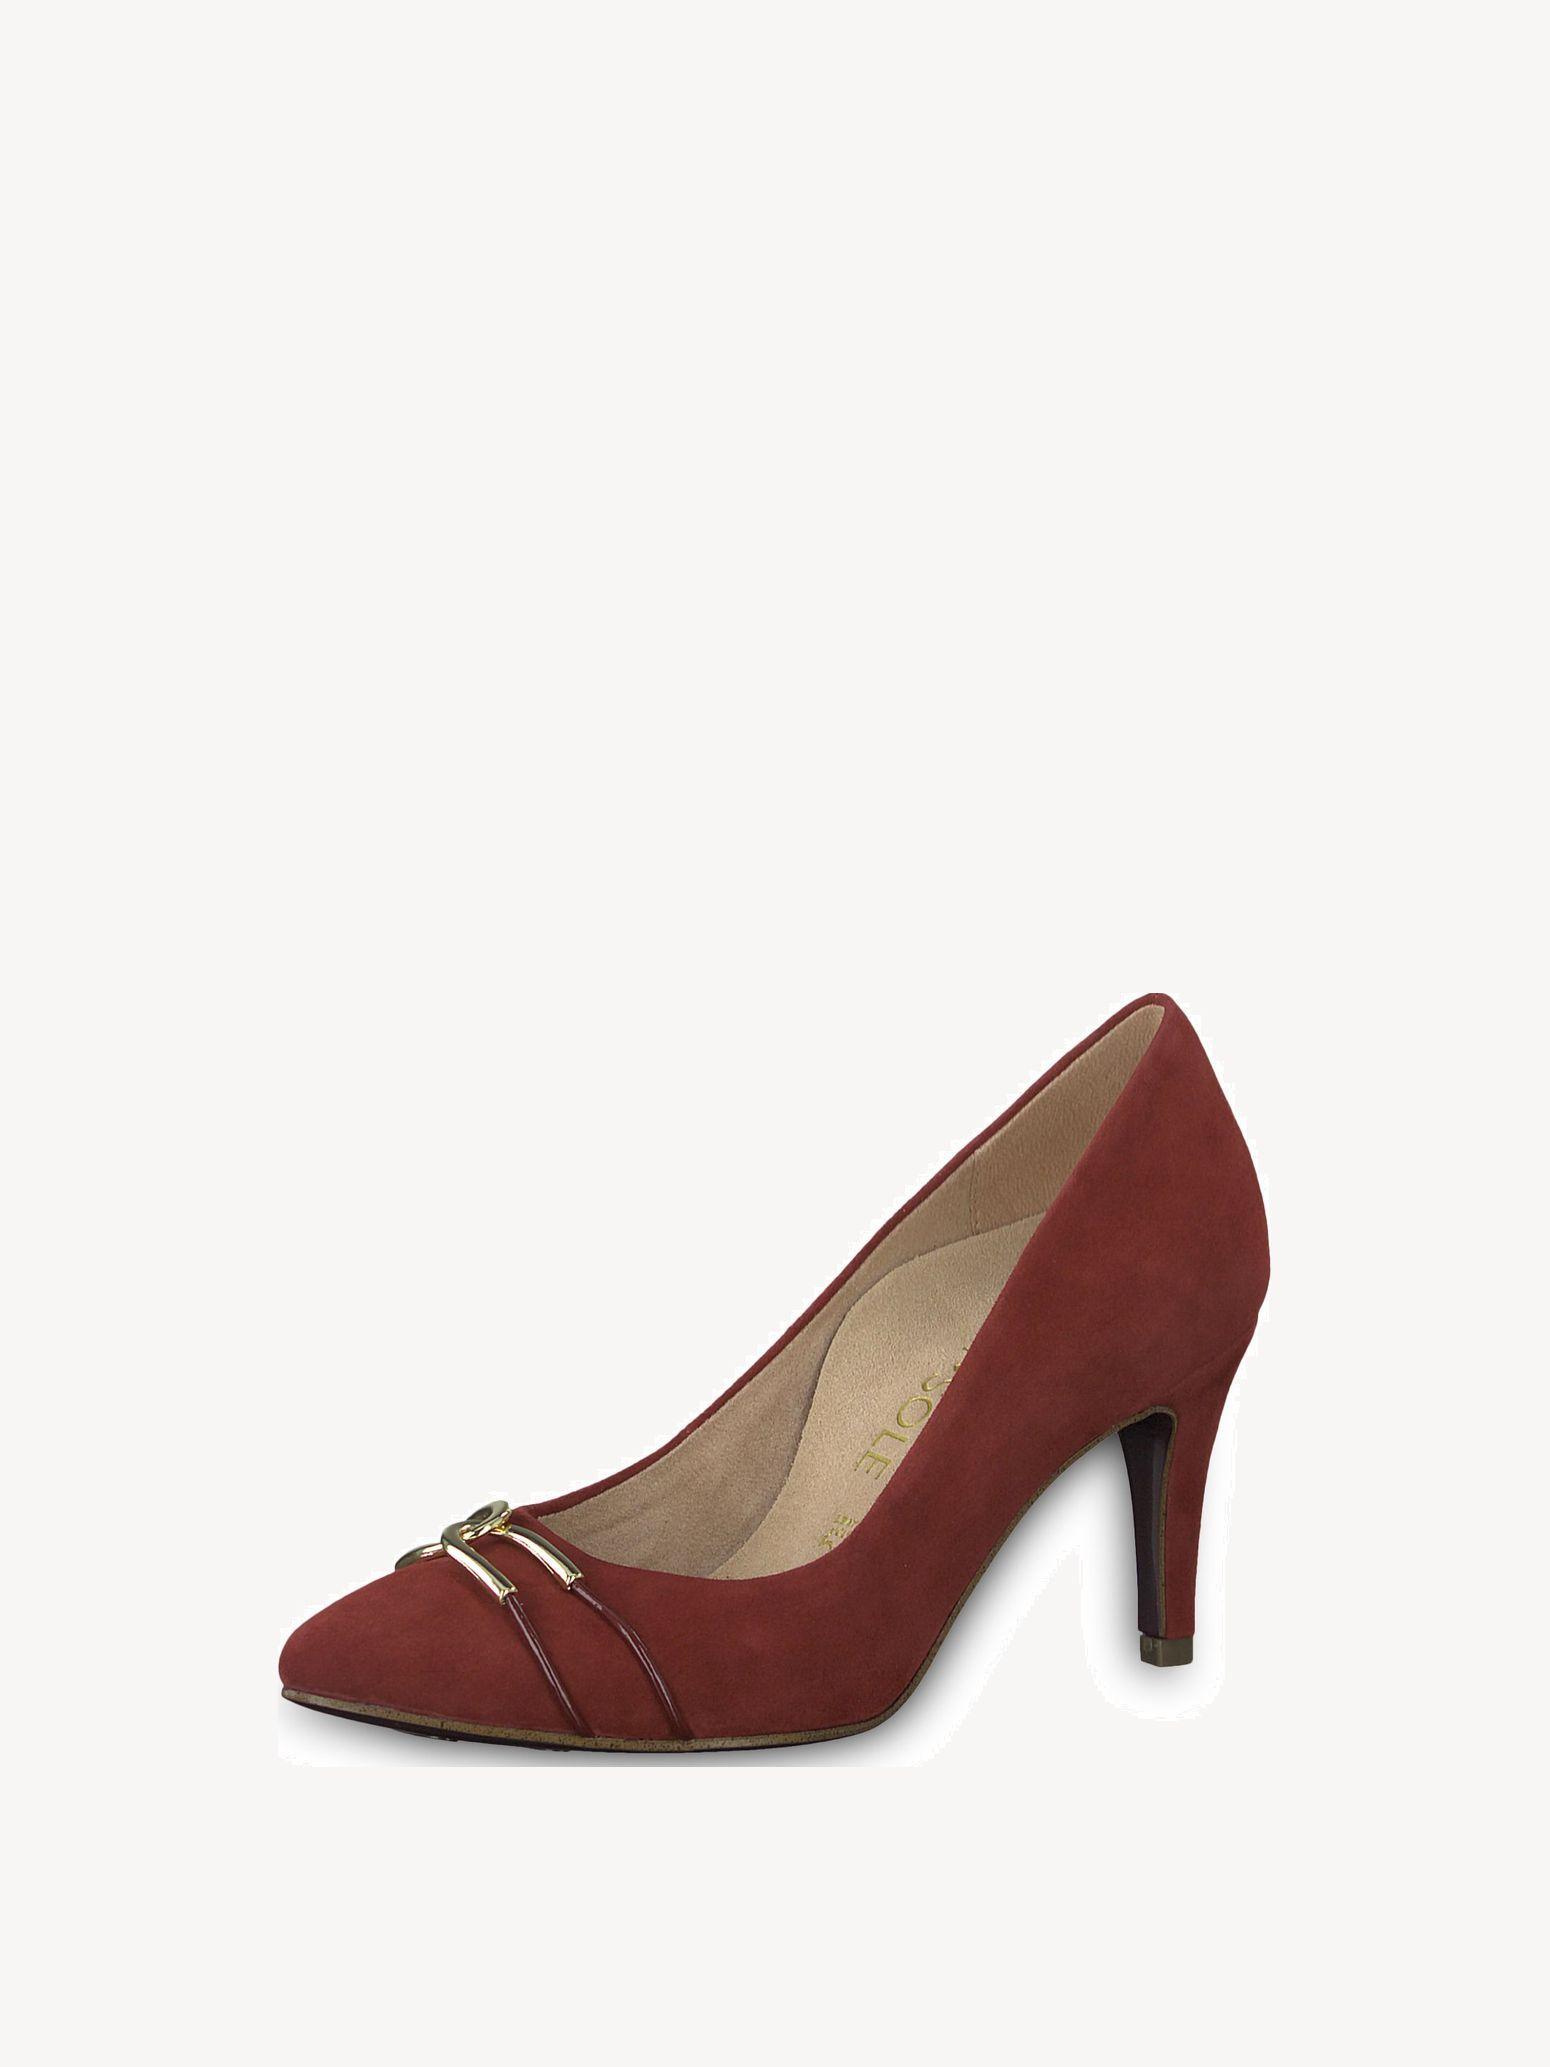 1 Kaufen 1 Heels High Heel Leder 22442 21Tamaris Online 2WEH9IYD